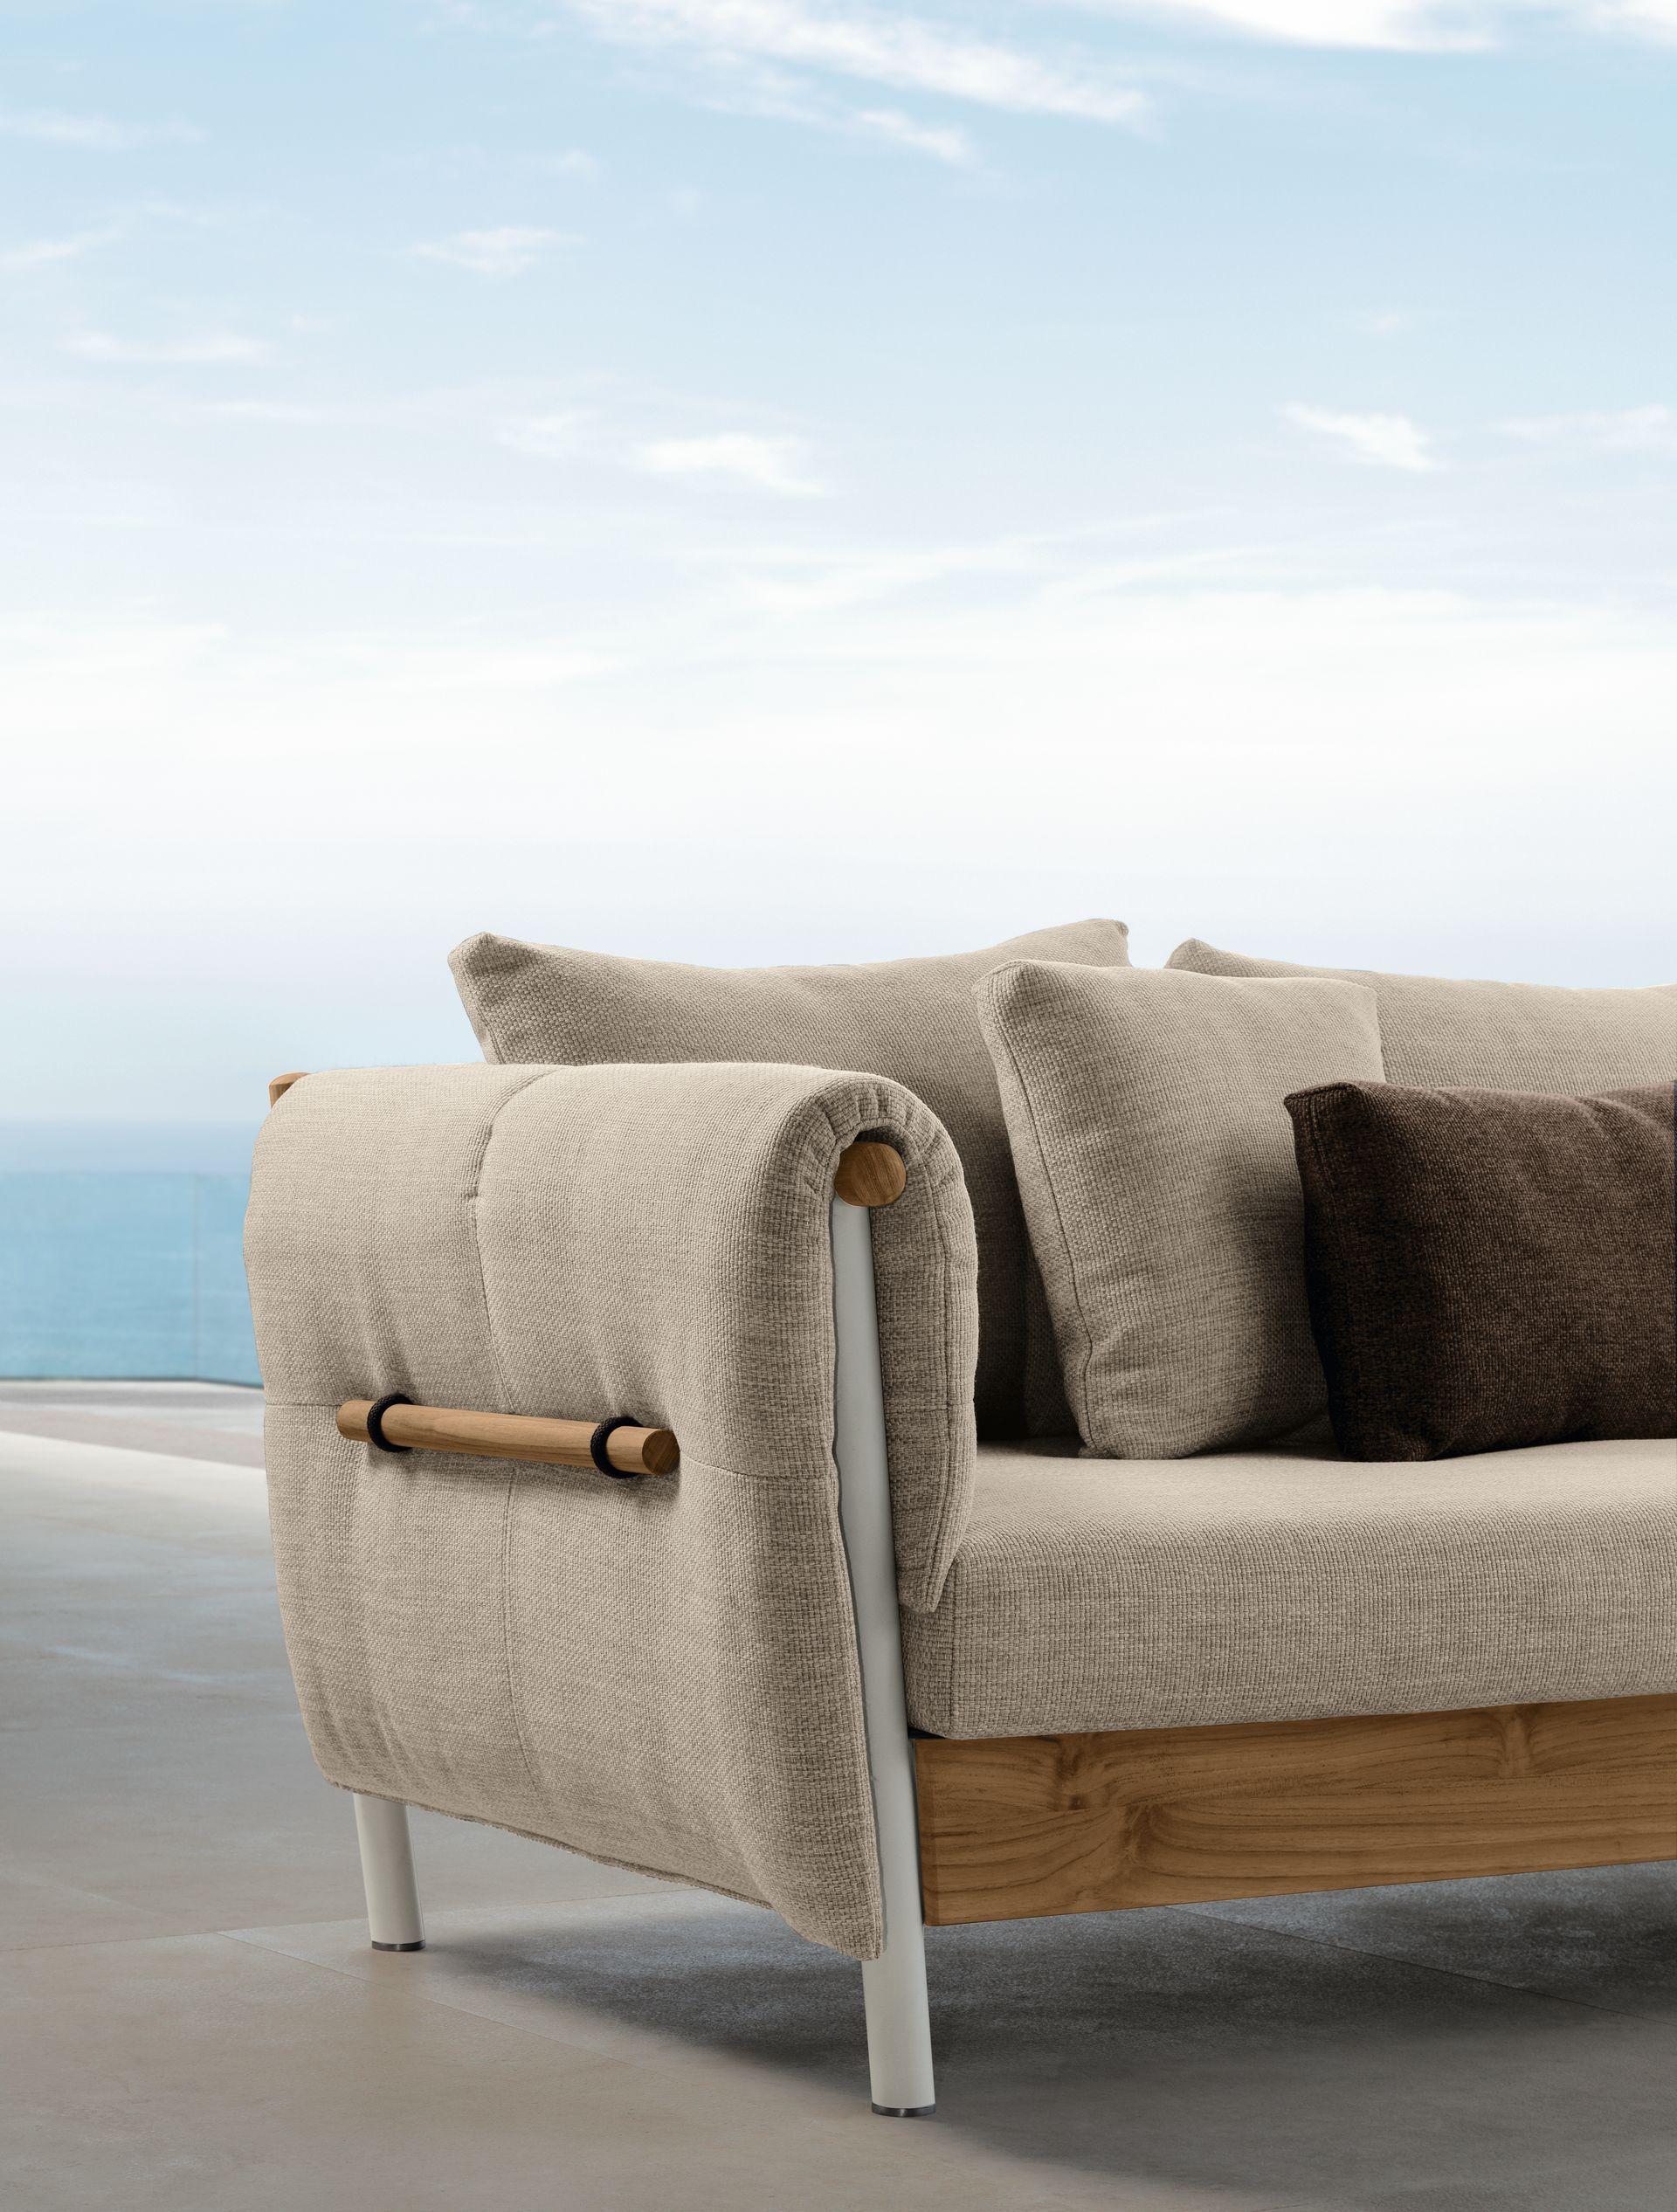 Domino Sofa Italian Garden Furniture Talenti Teak Outdoor Furniture Cheap Furniture Furniture Design